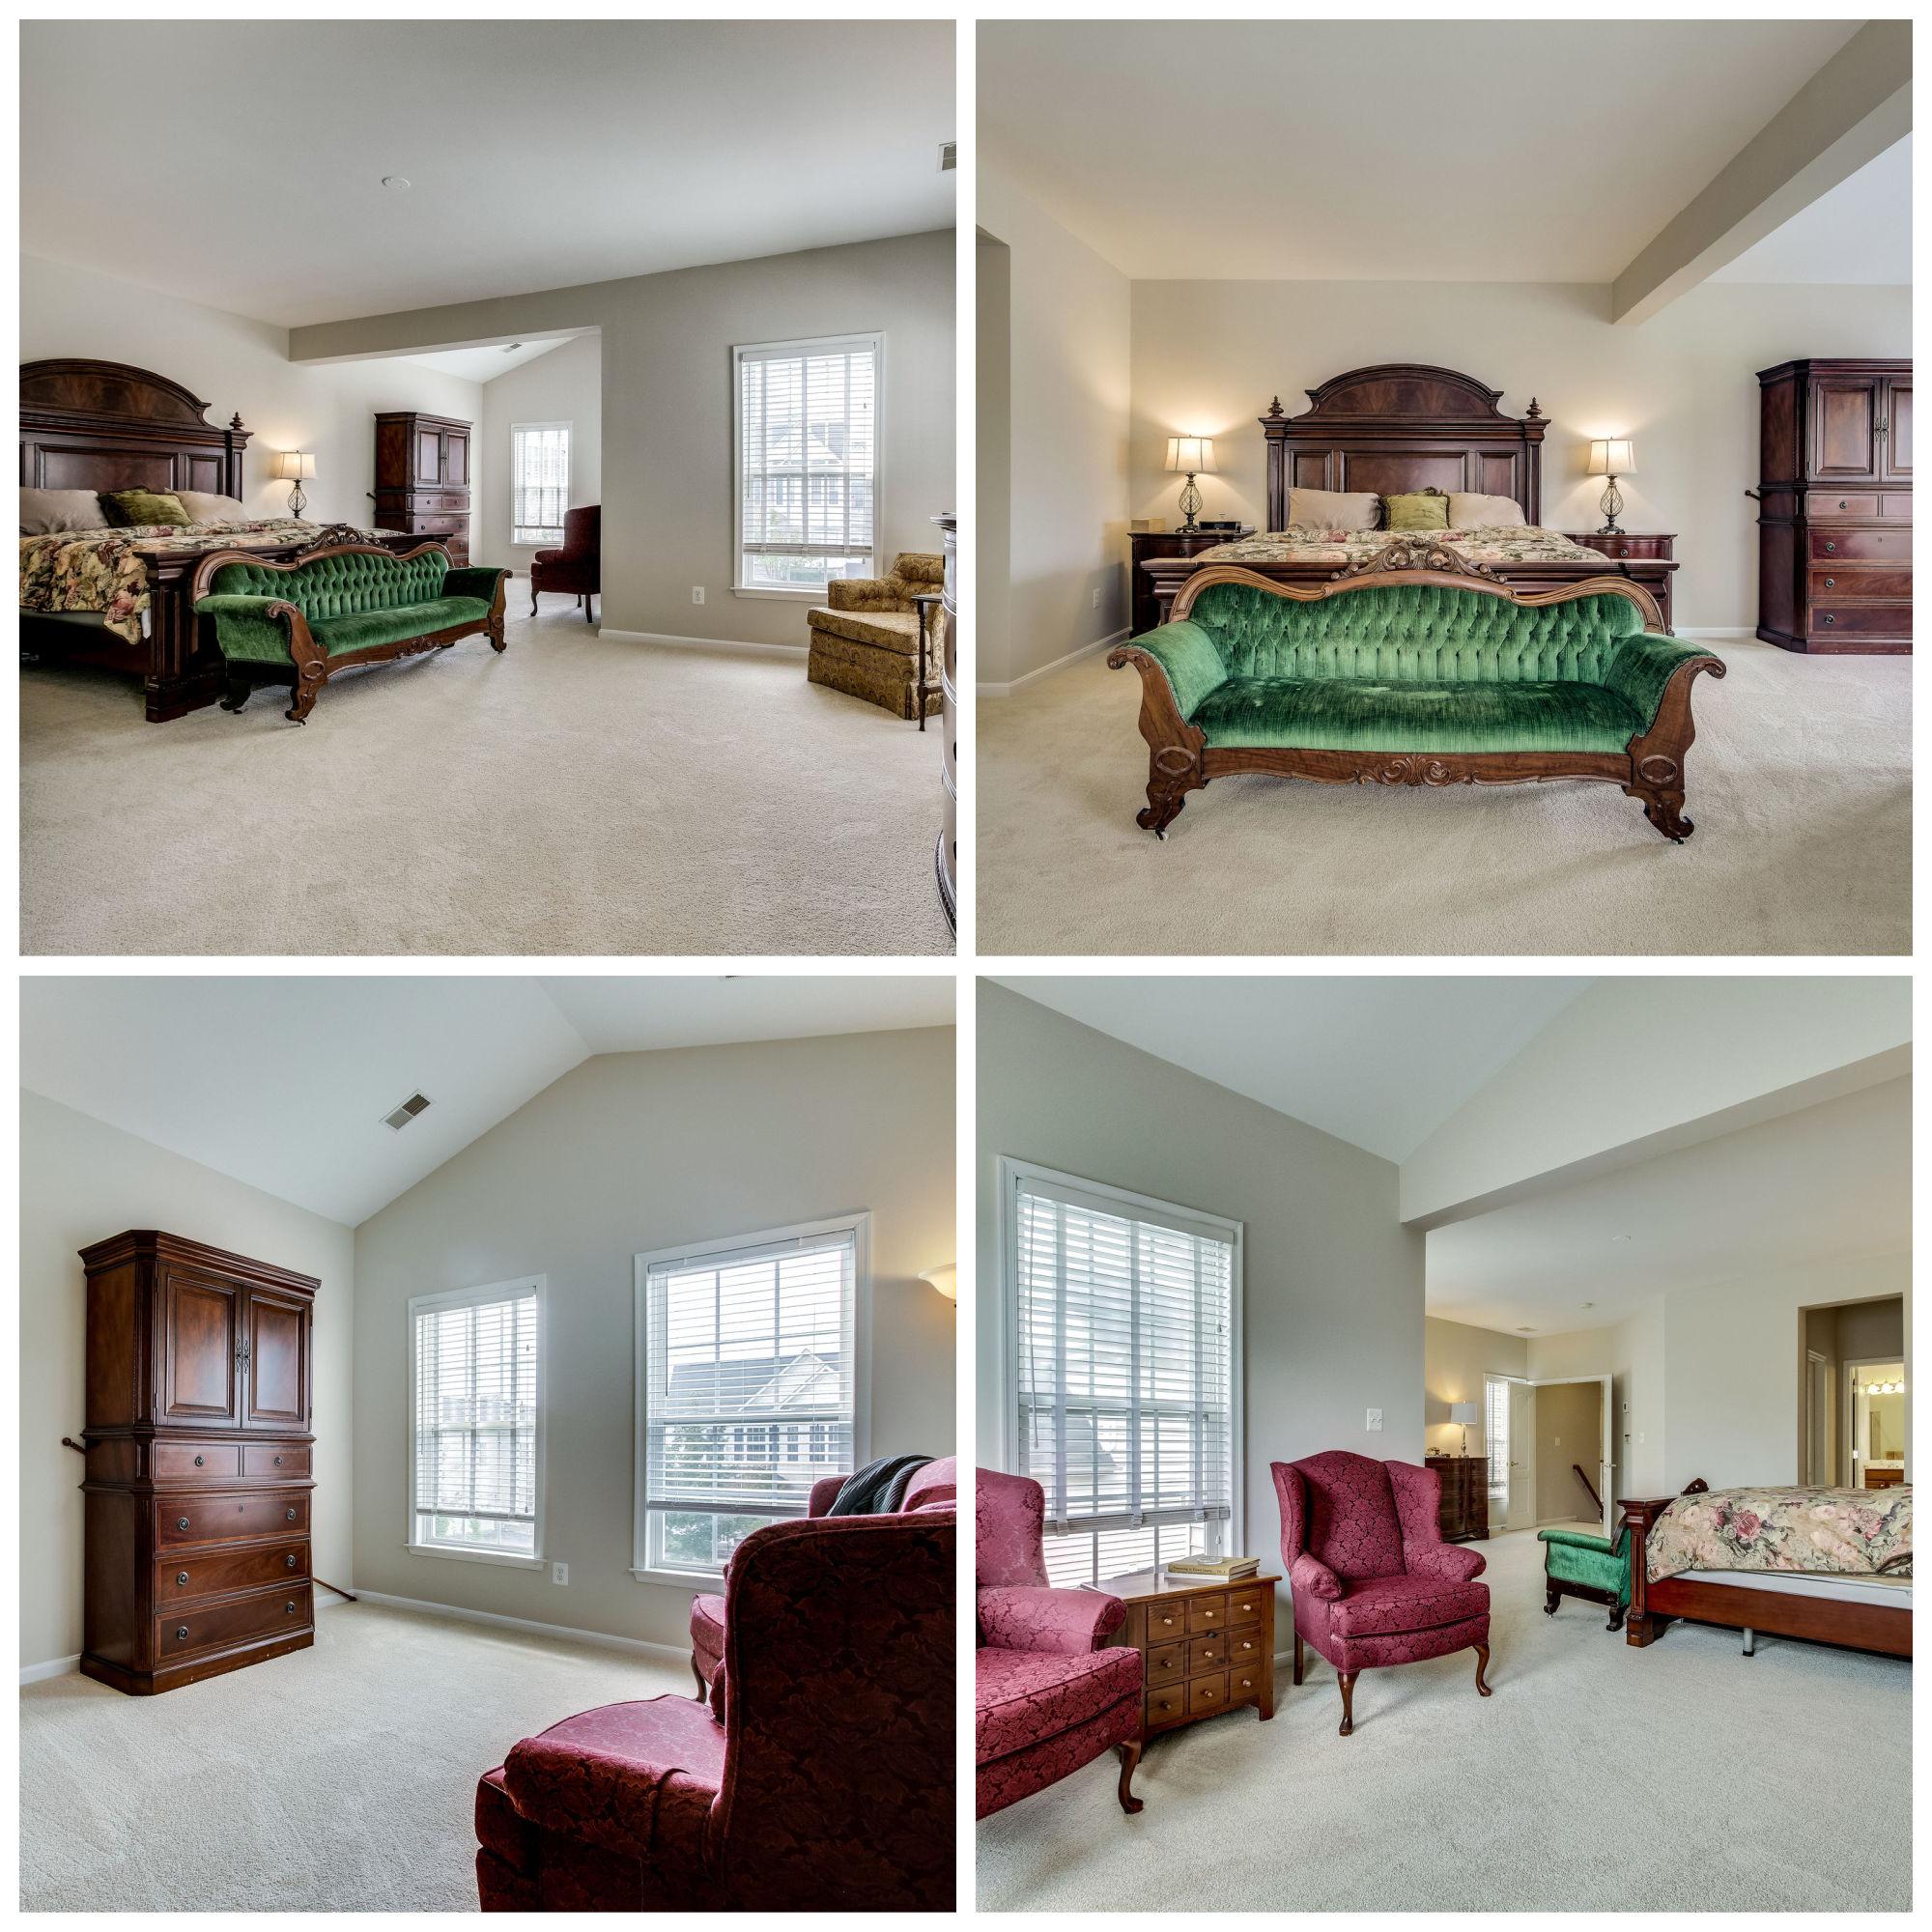 21930 Windover Dr, Broadlands- Primary Bedroom